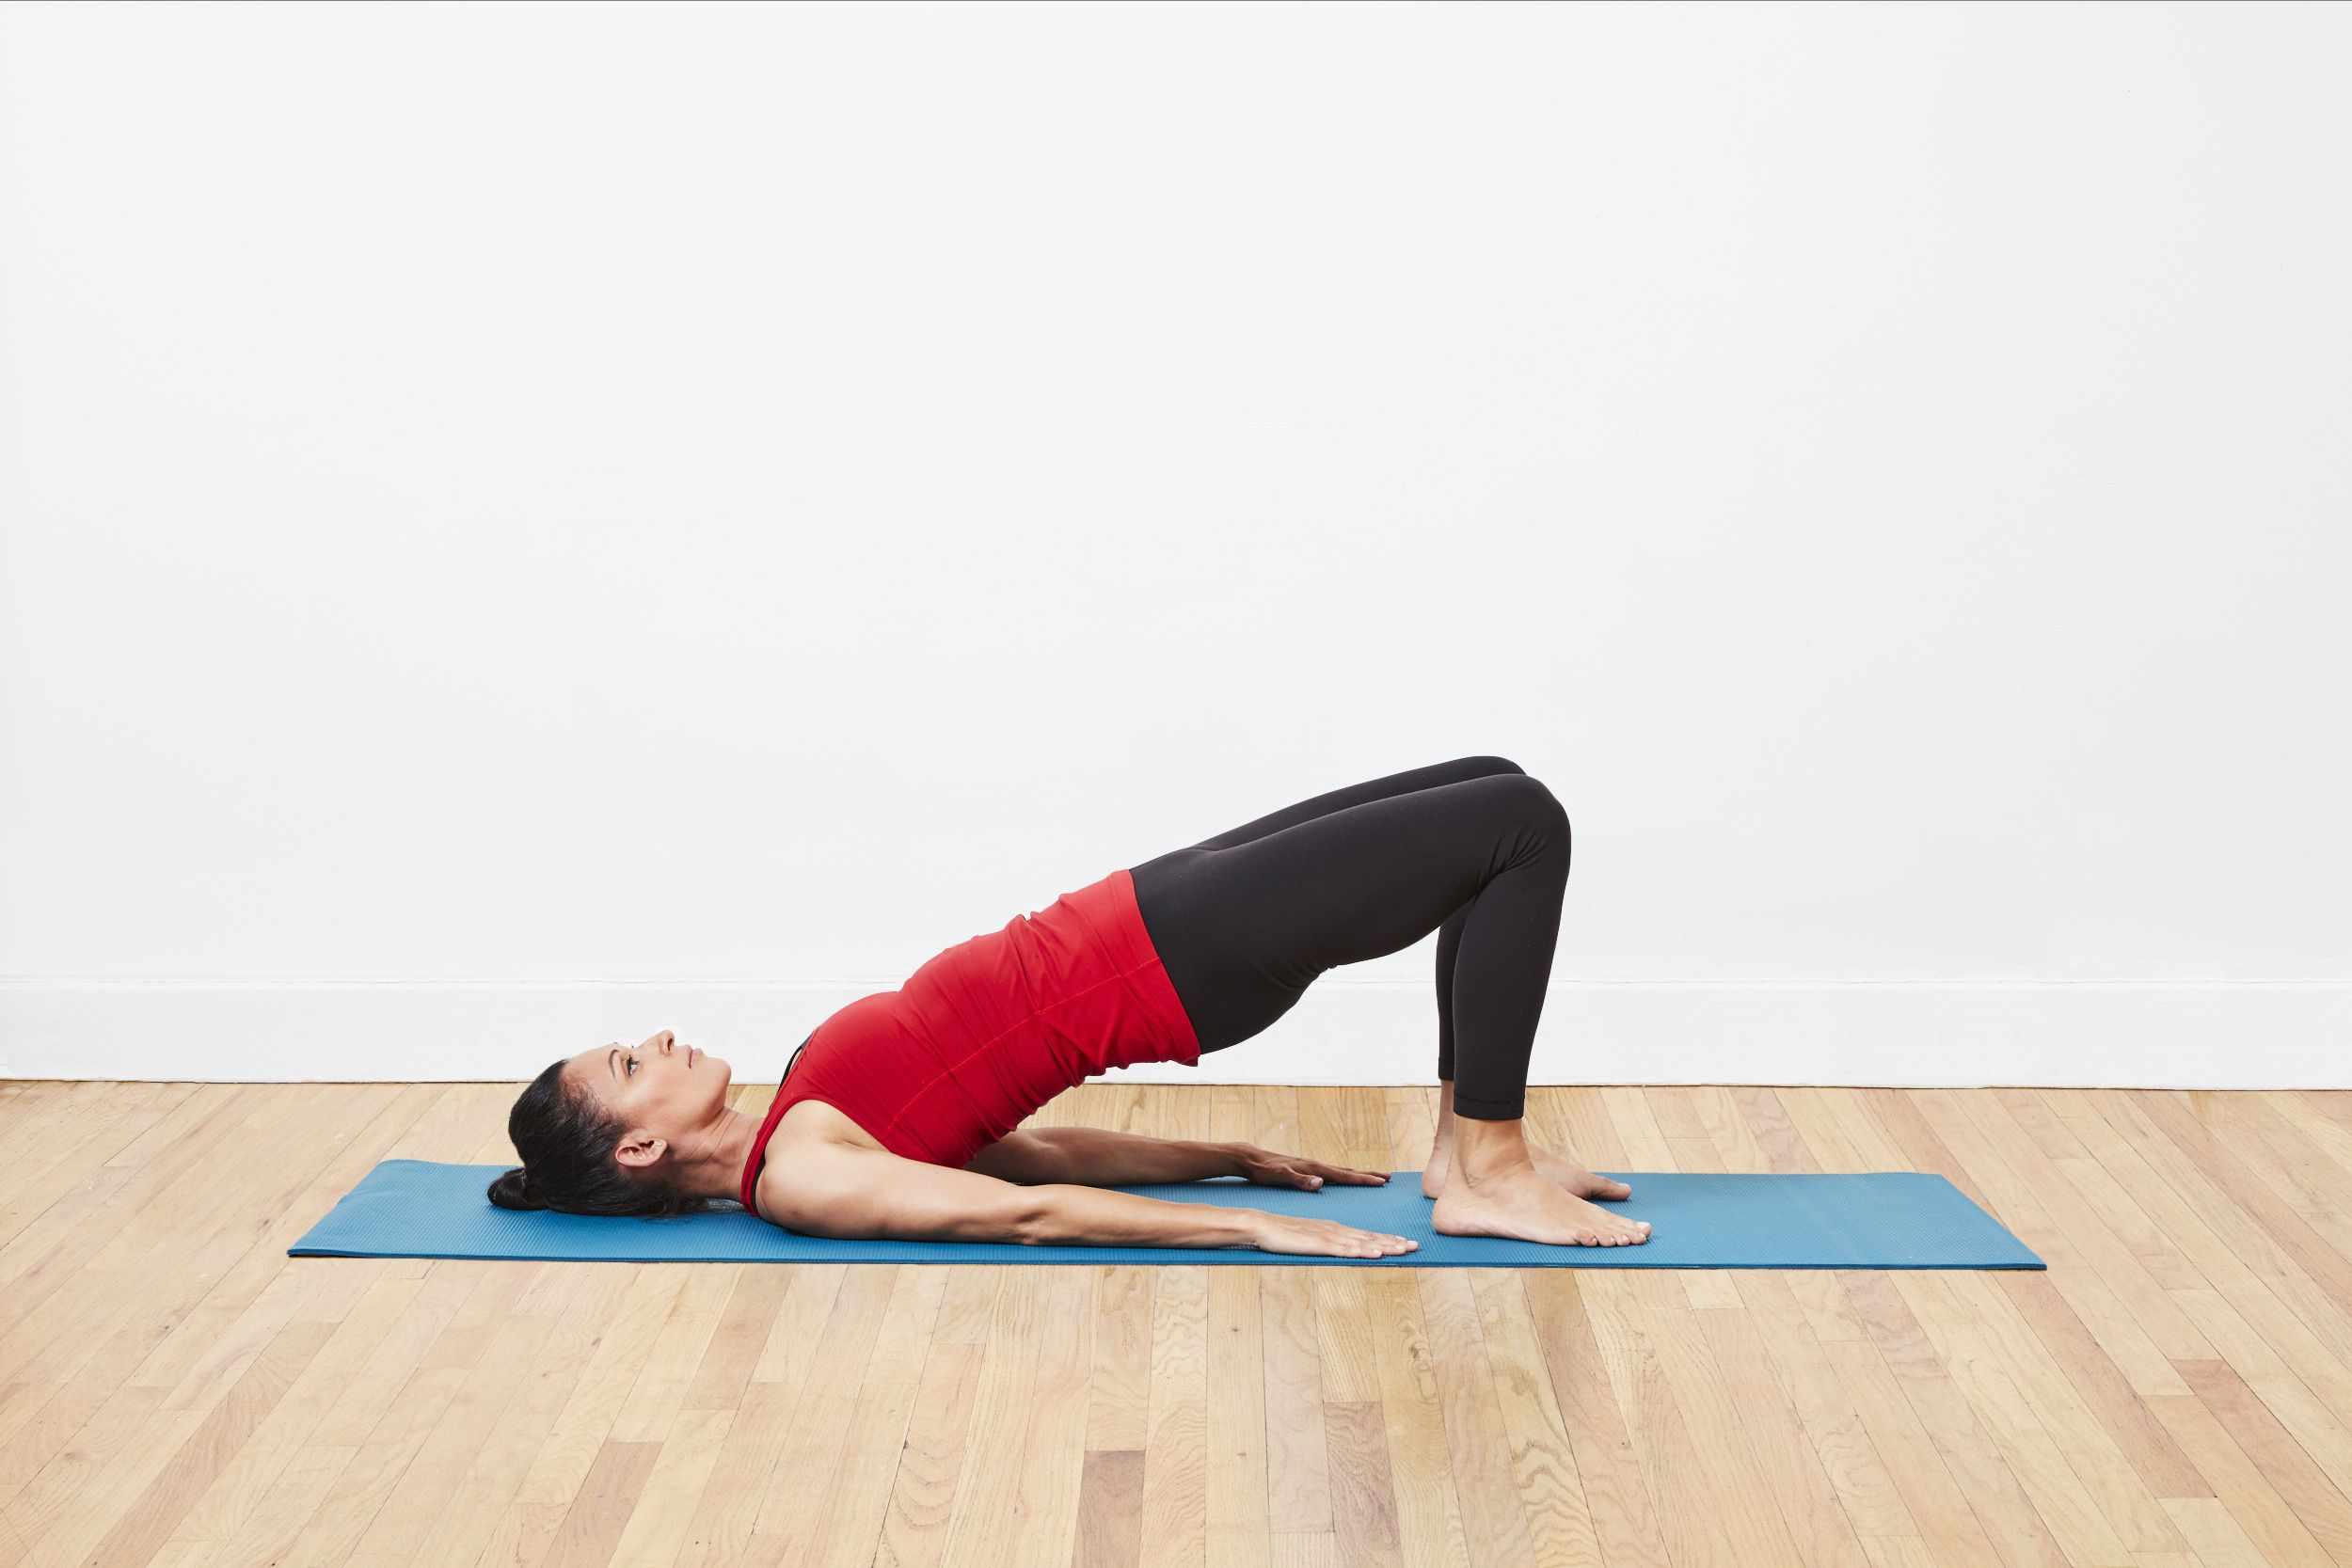 Woman performing basic bridge stretch